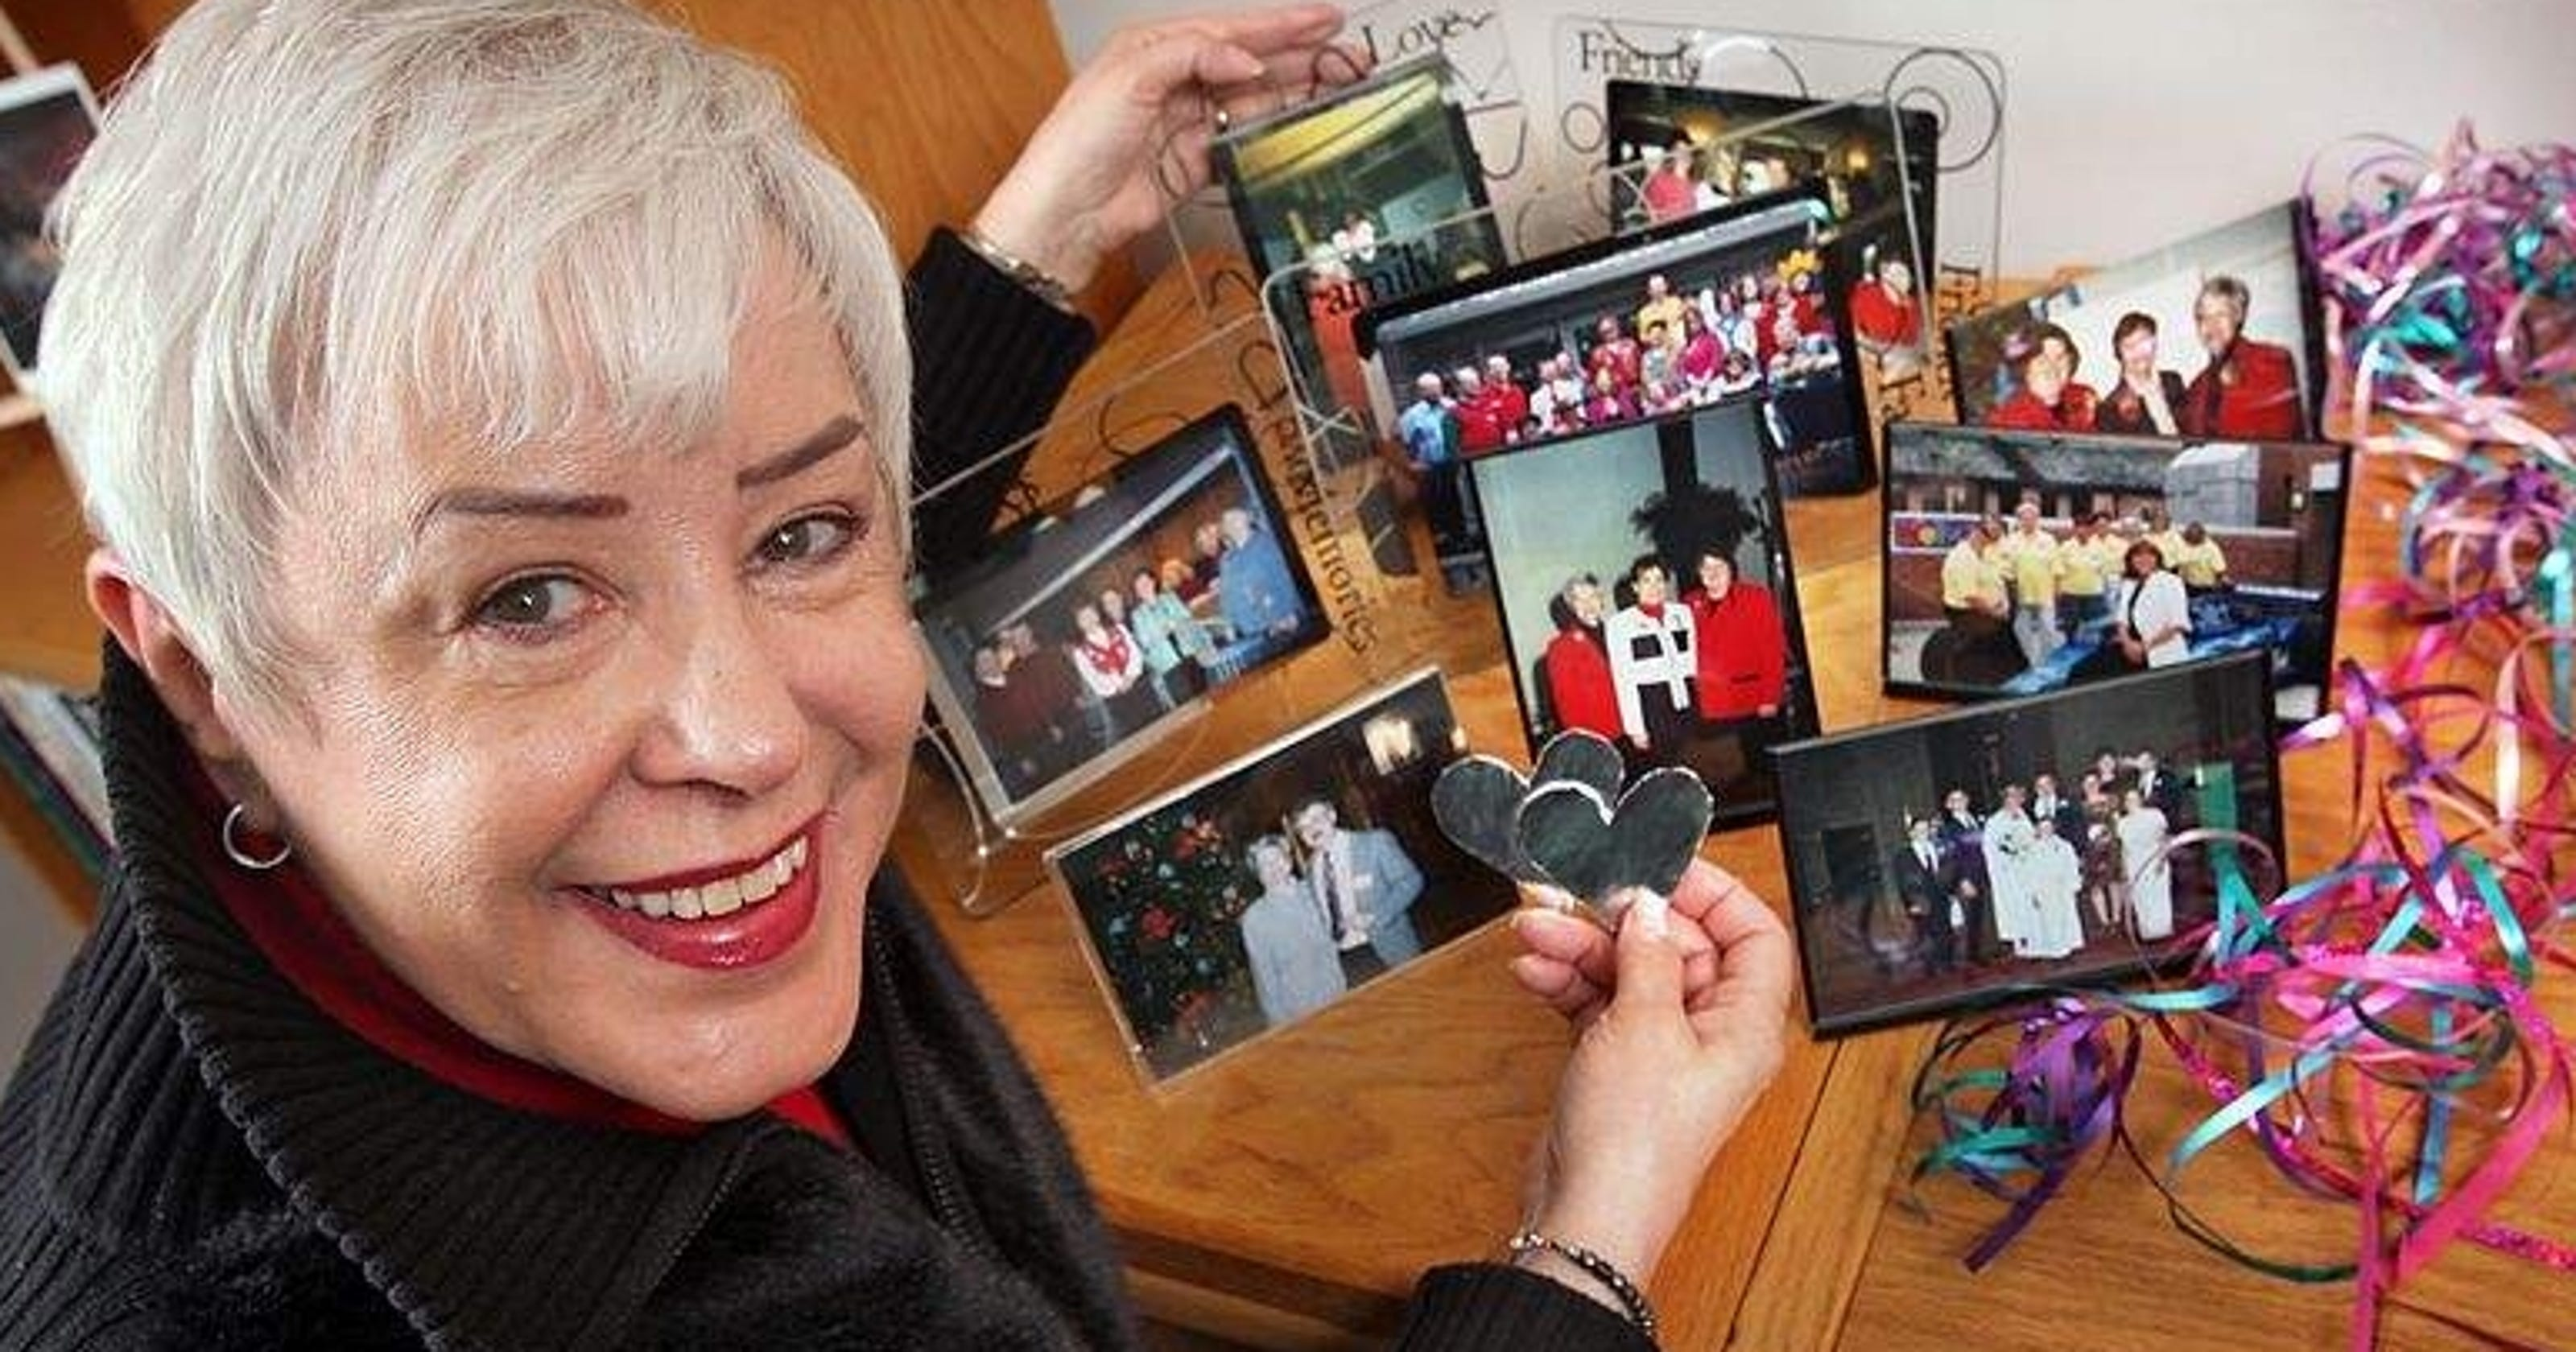 Indiana matchmaking service, movies lesbian sex